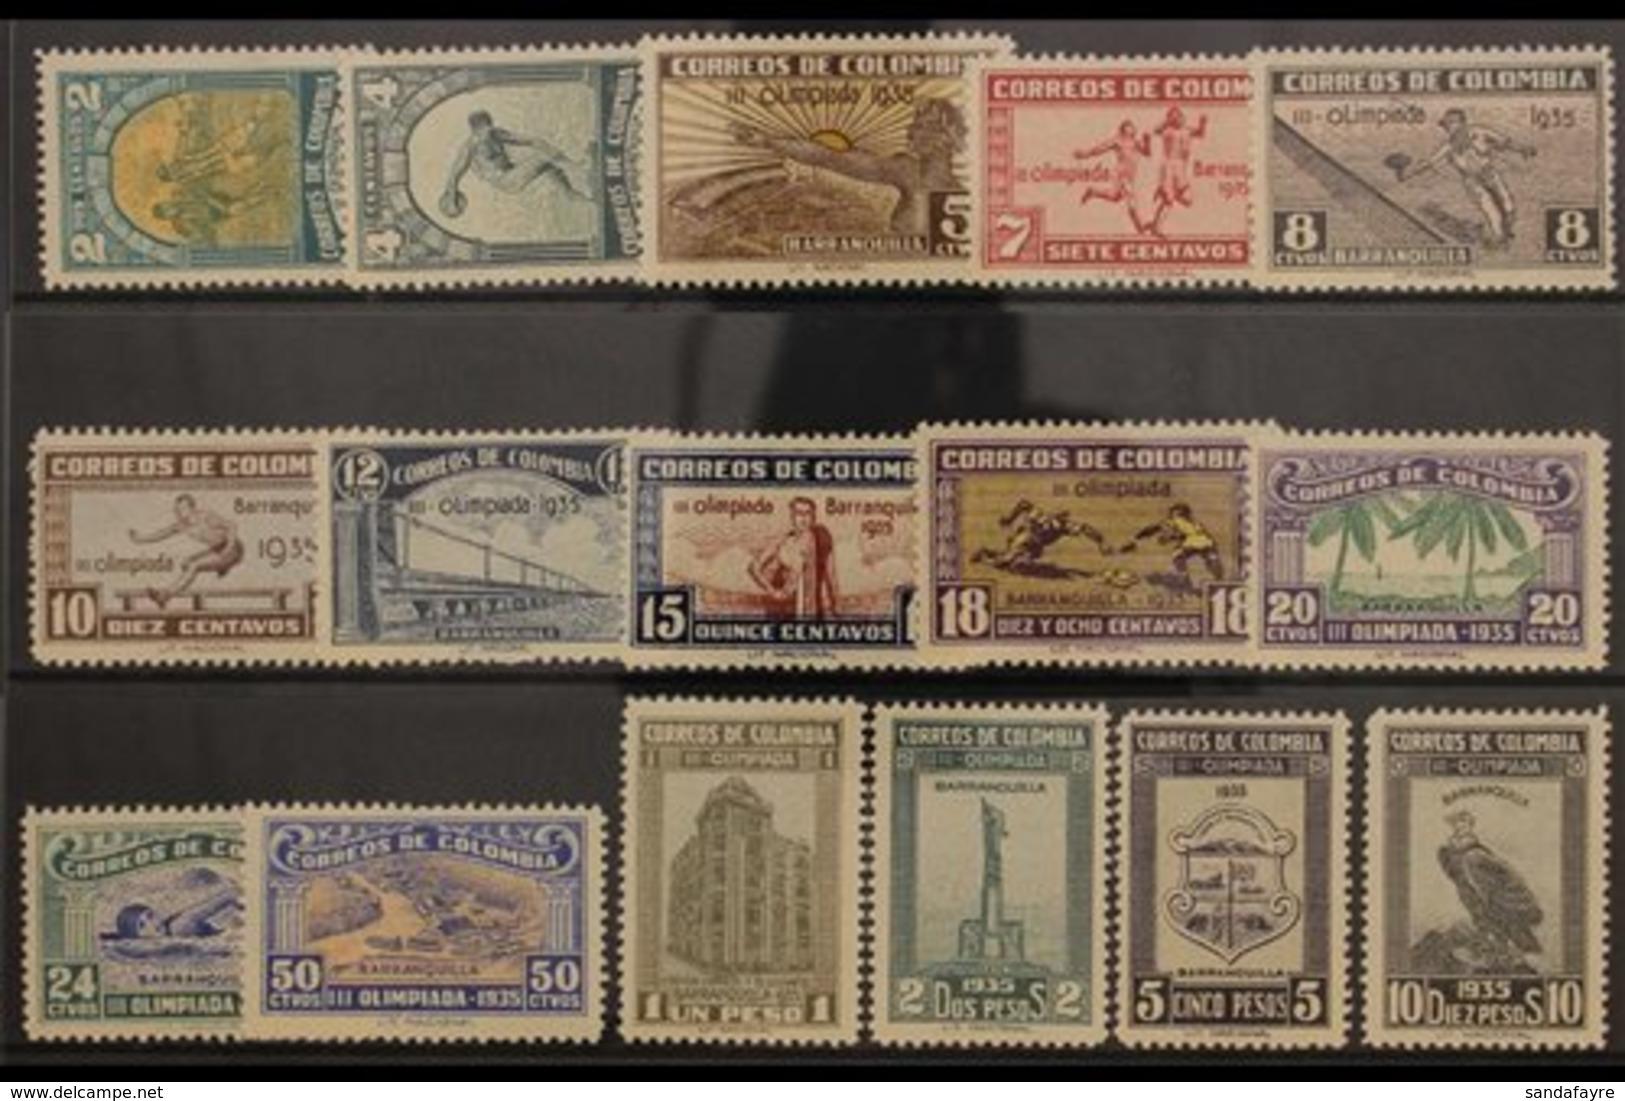 1935 OLYMPIC GAMES SET Third National Olympiad / Sports Set Complete, SG 461/476 (Scott 421/36), A Seldom Seen Very Fine - Kolumbien